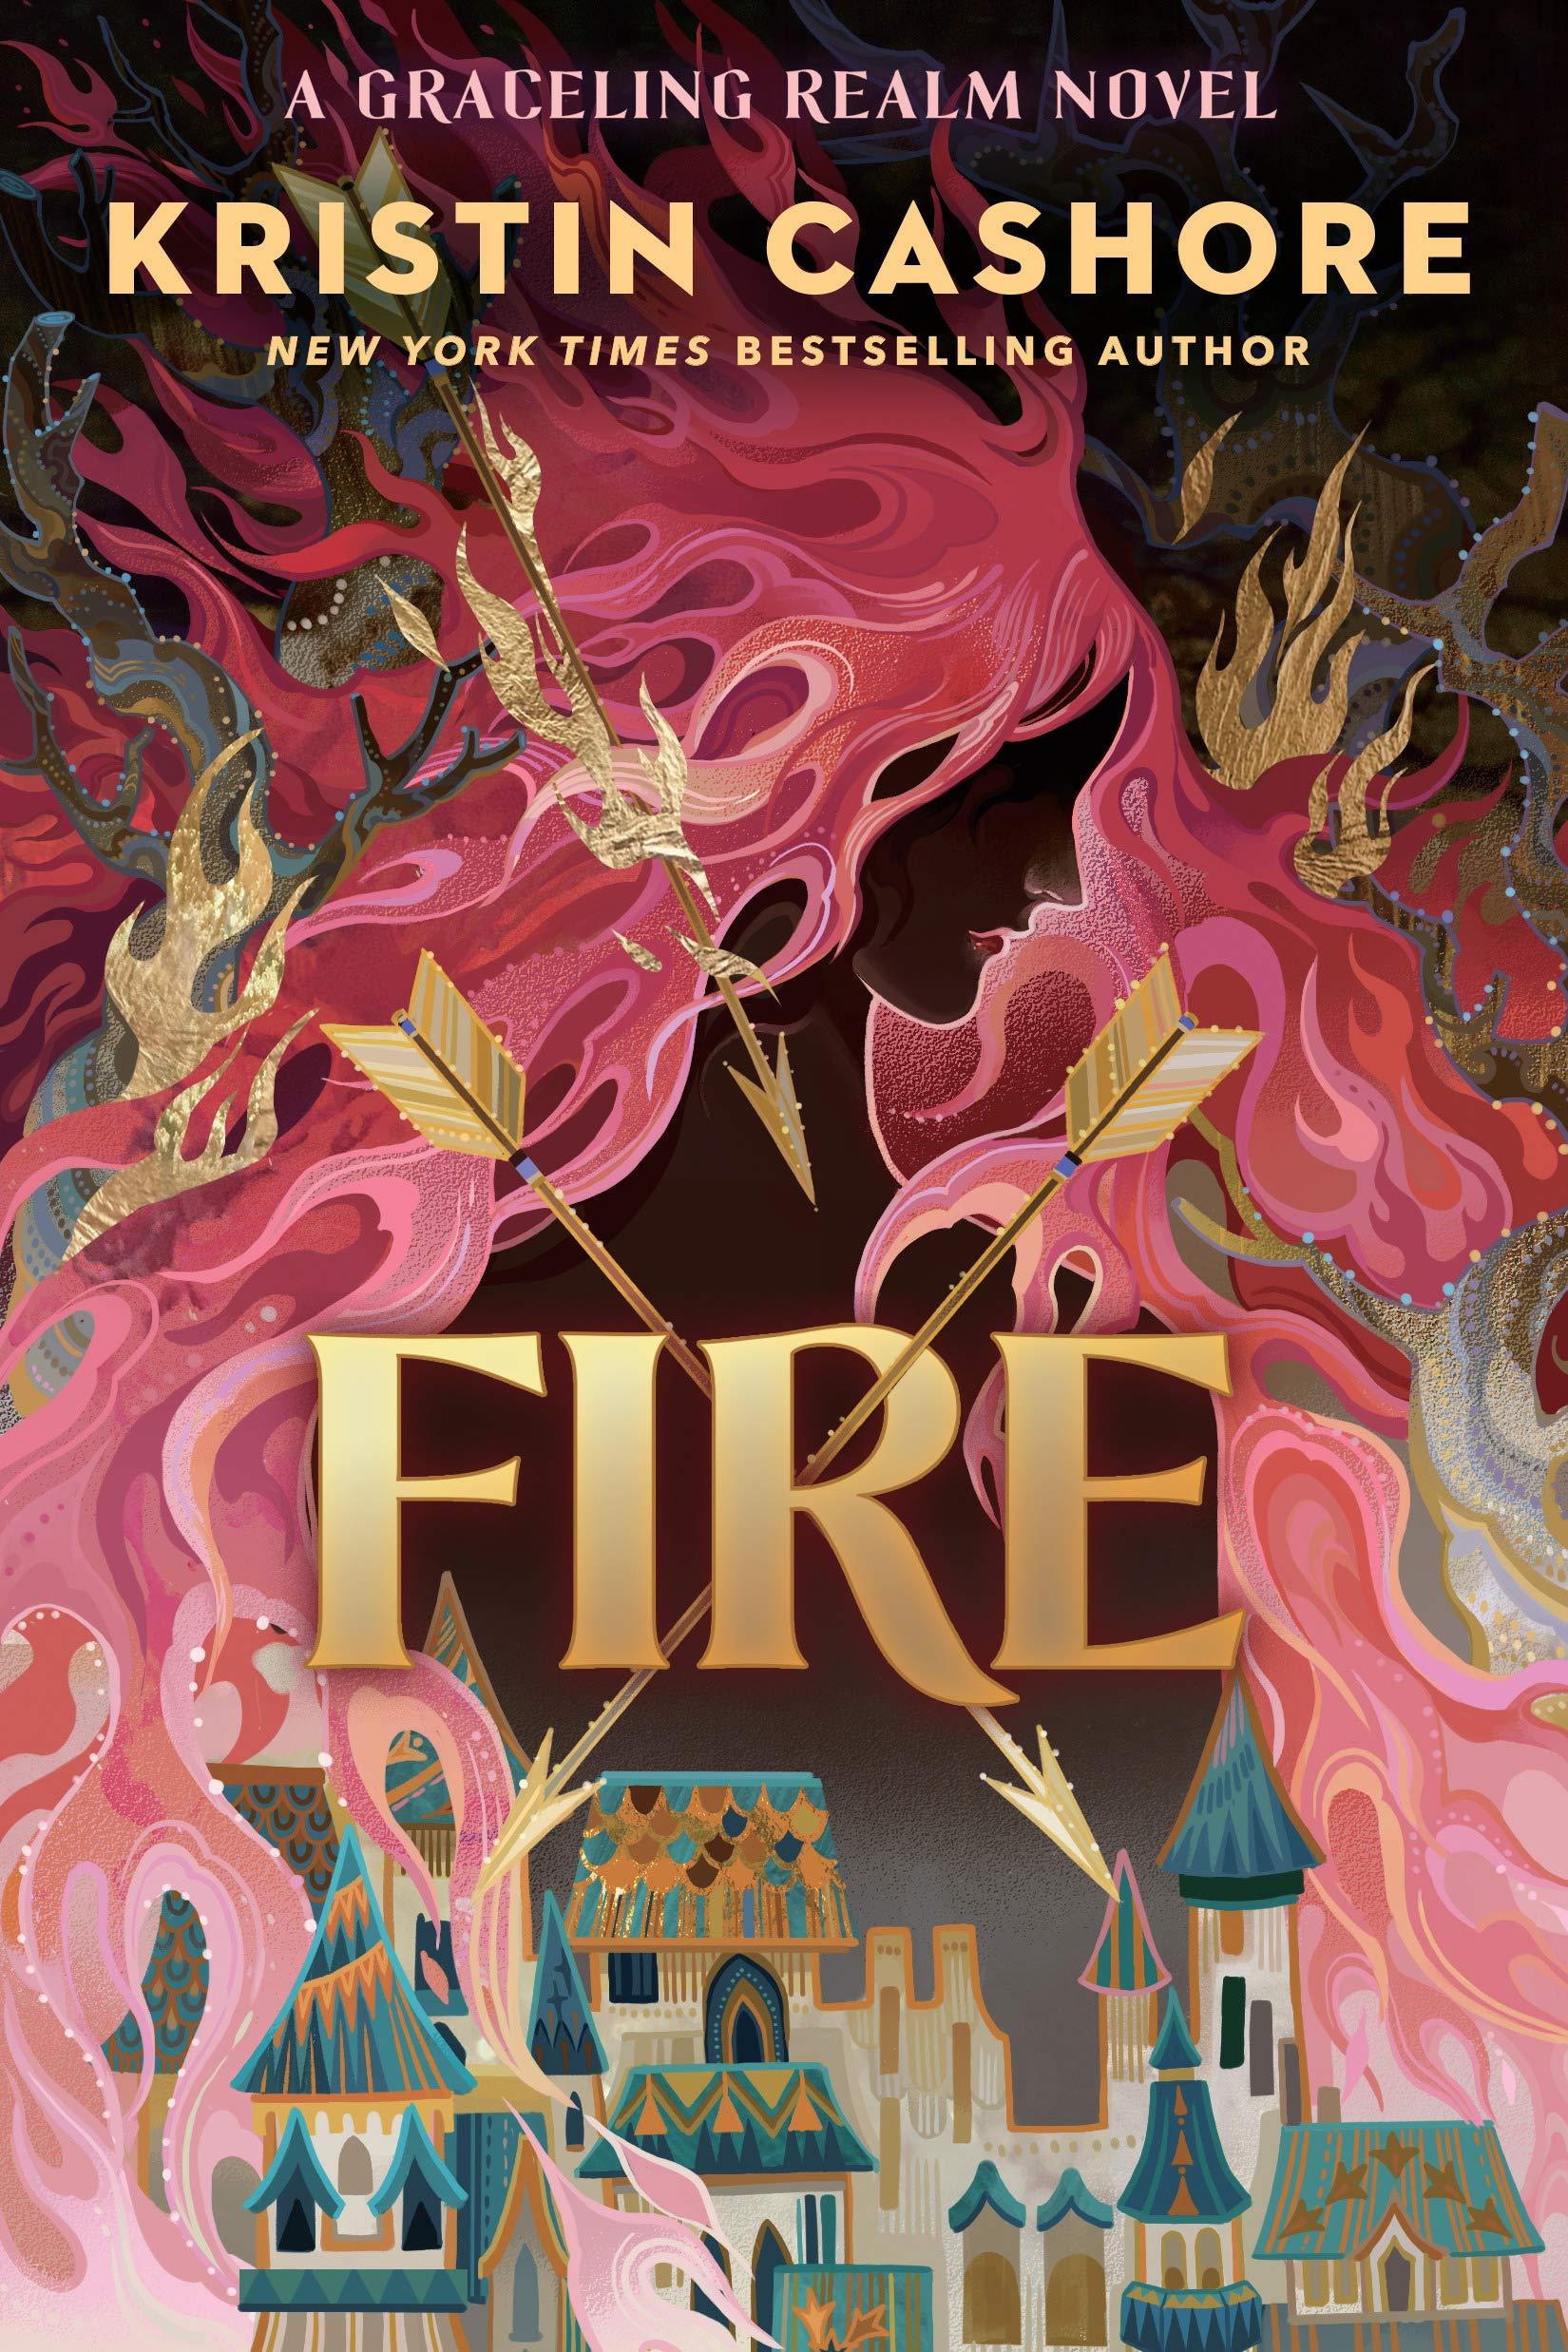 Amazon.com: Fire (A Companion to Graceling) (9780142415917): Cashore,  Kristin: Books